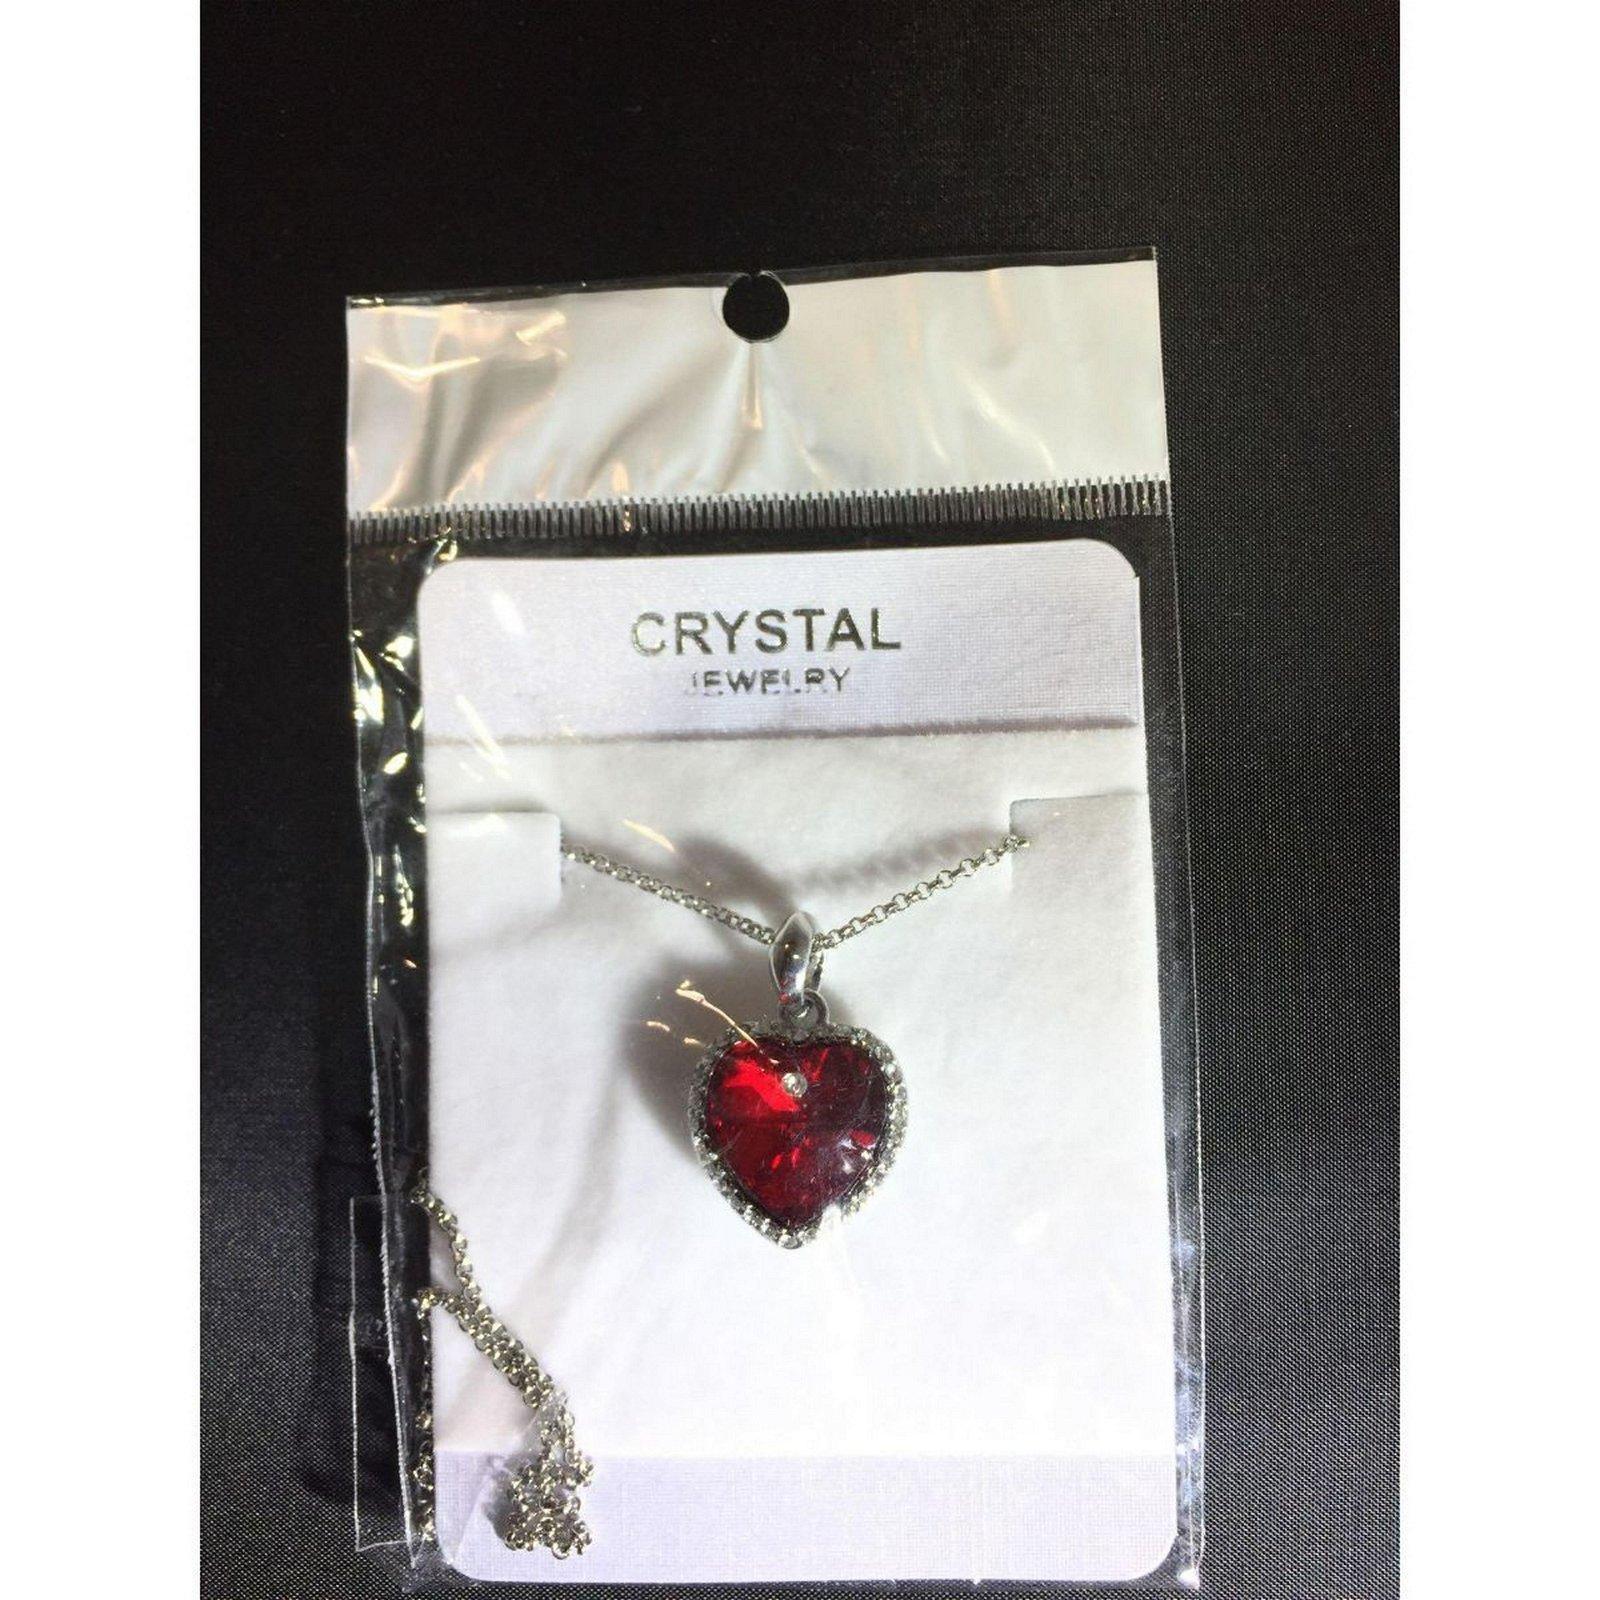 Austrian Crystal with Swarovski Elements - Red heart